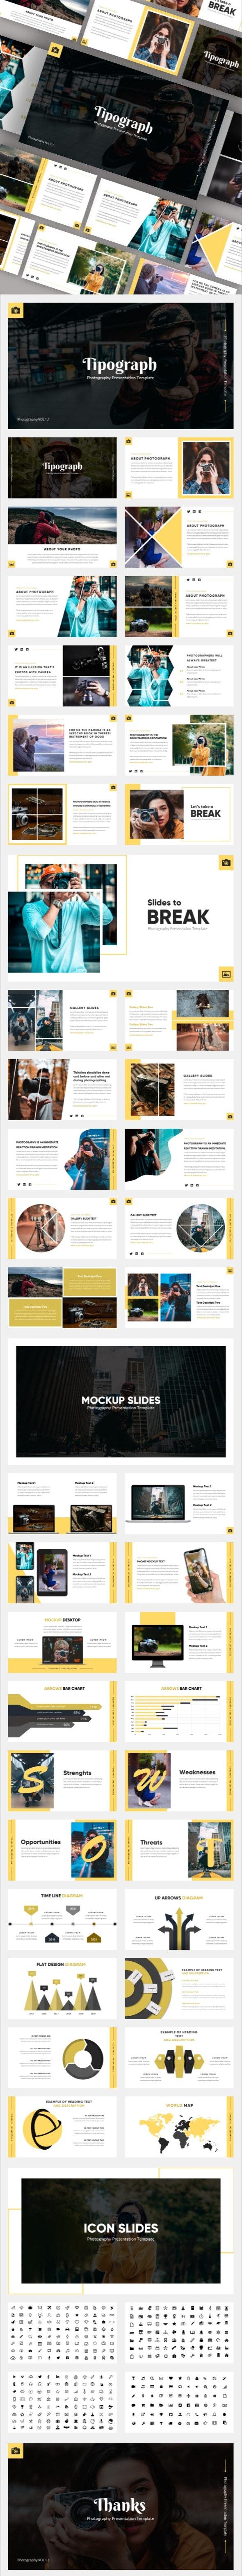 Tipograph - Photography Google Slides Template - Google Slides Presentation Templates